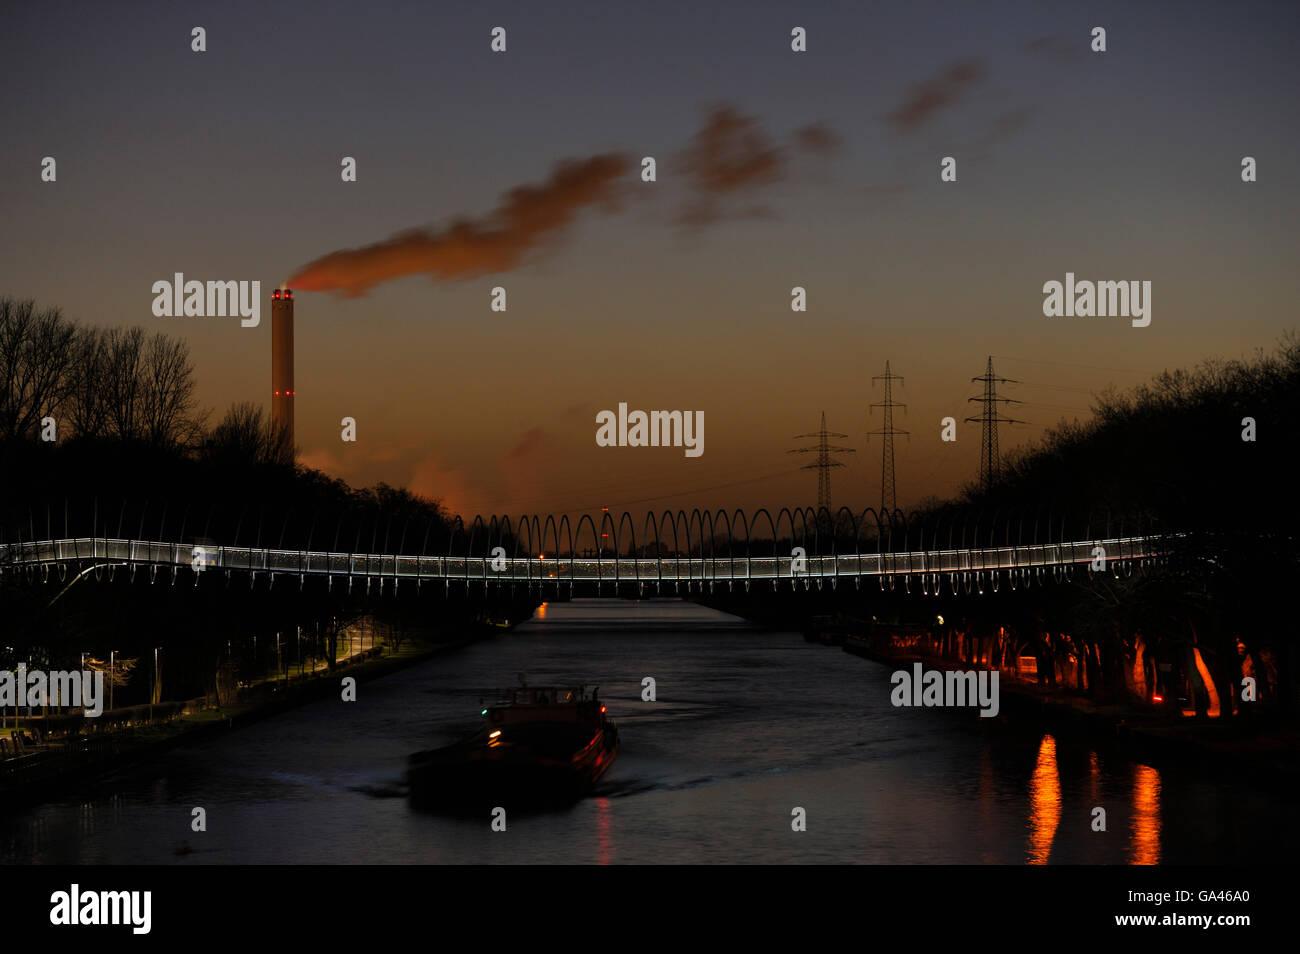 Rhein-Herne-Kanal, in the evening, Oberhausen, Germany - Stock Image